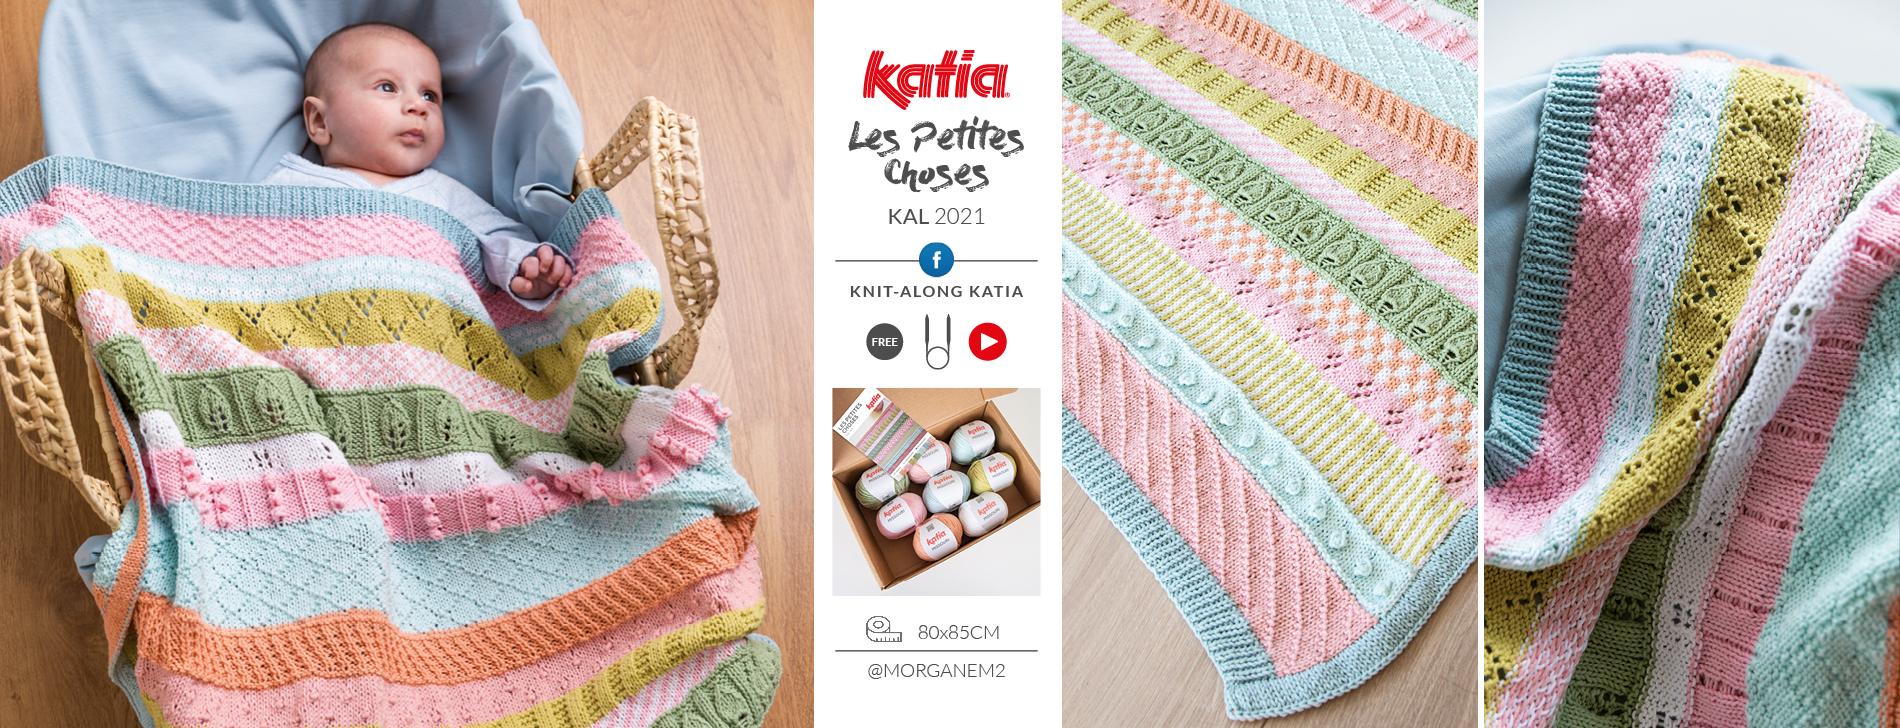 KAL Les Petites Choses